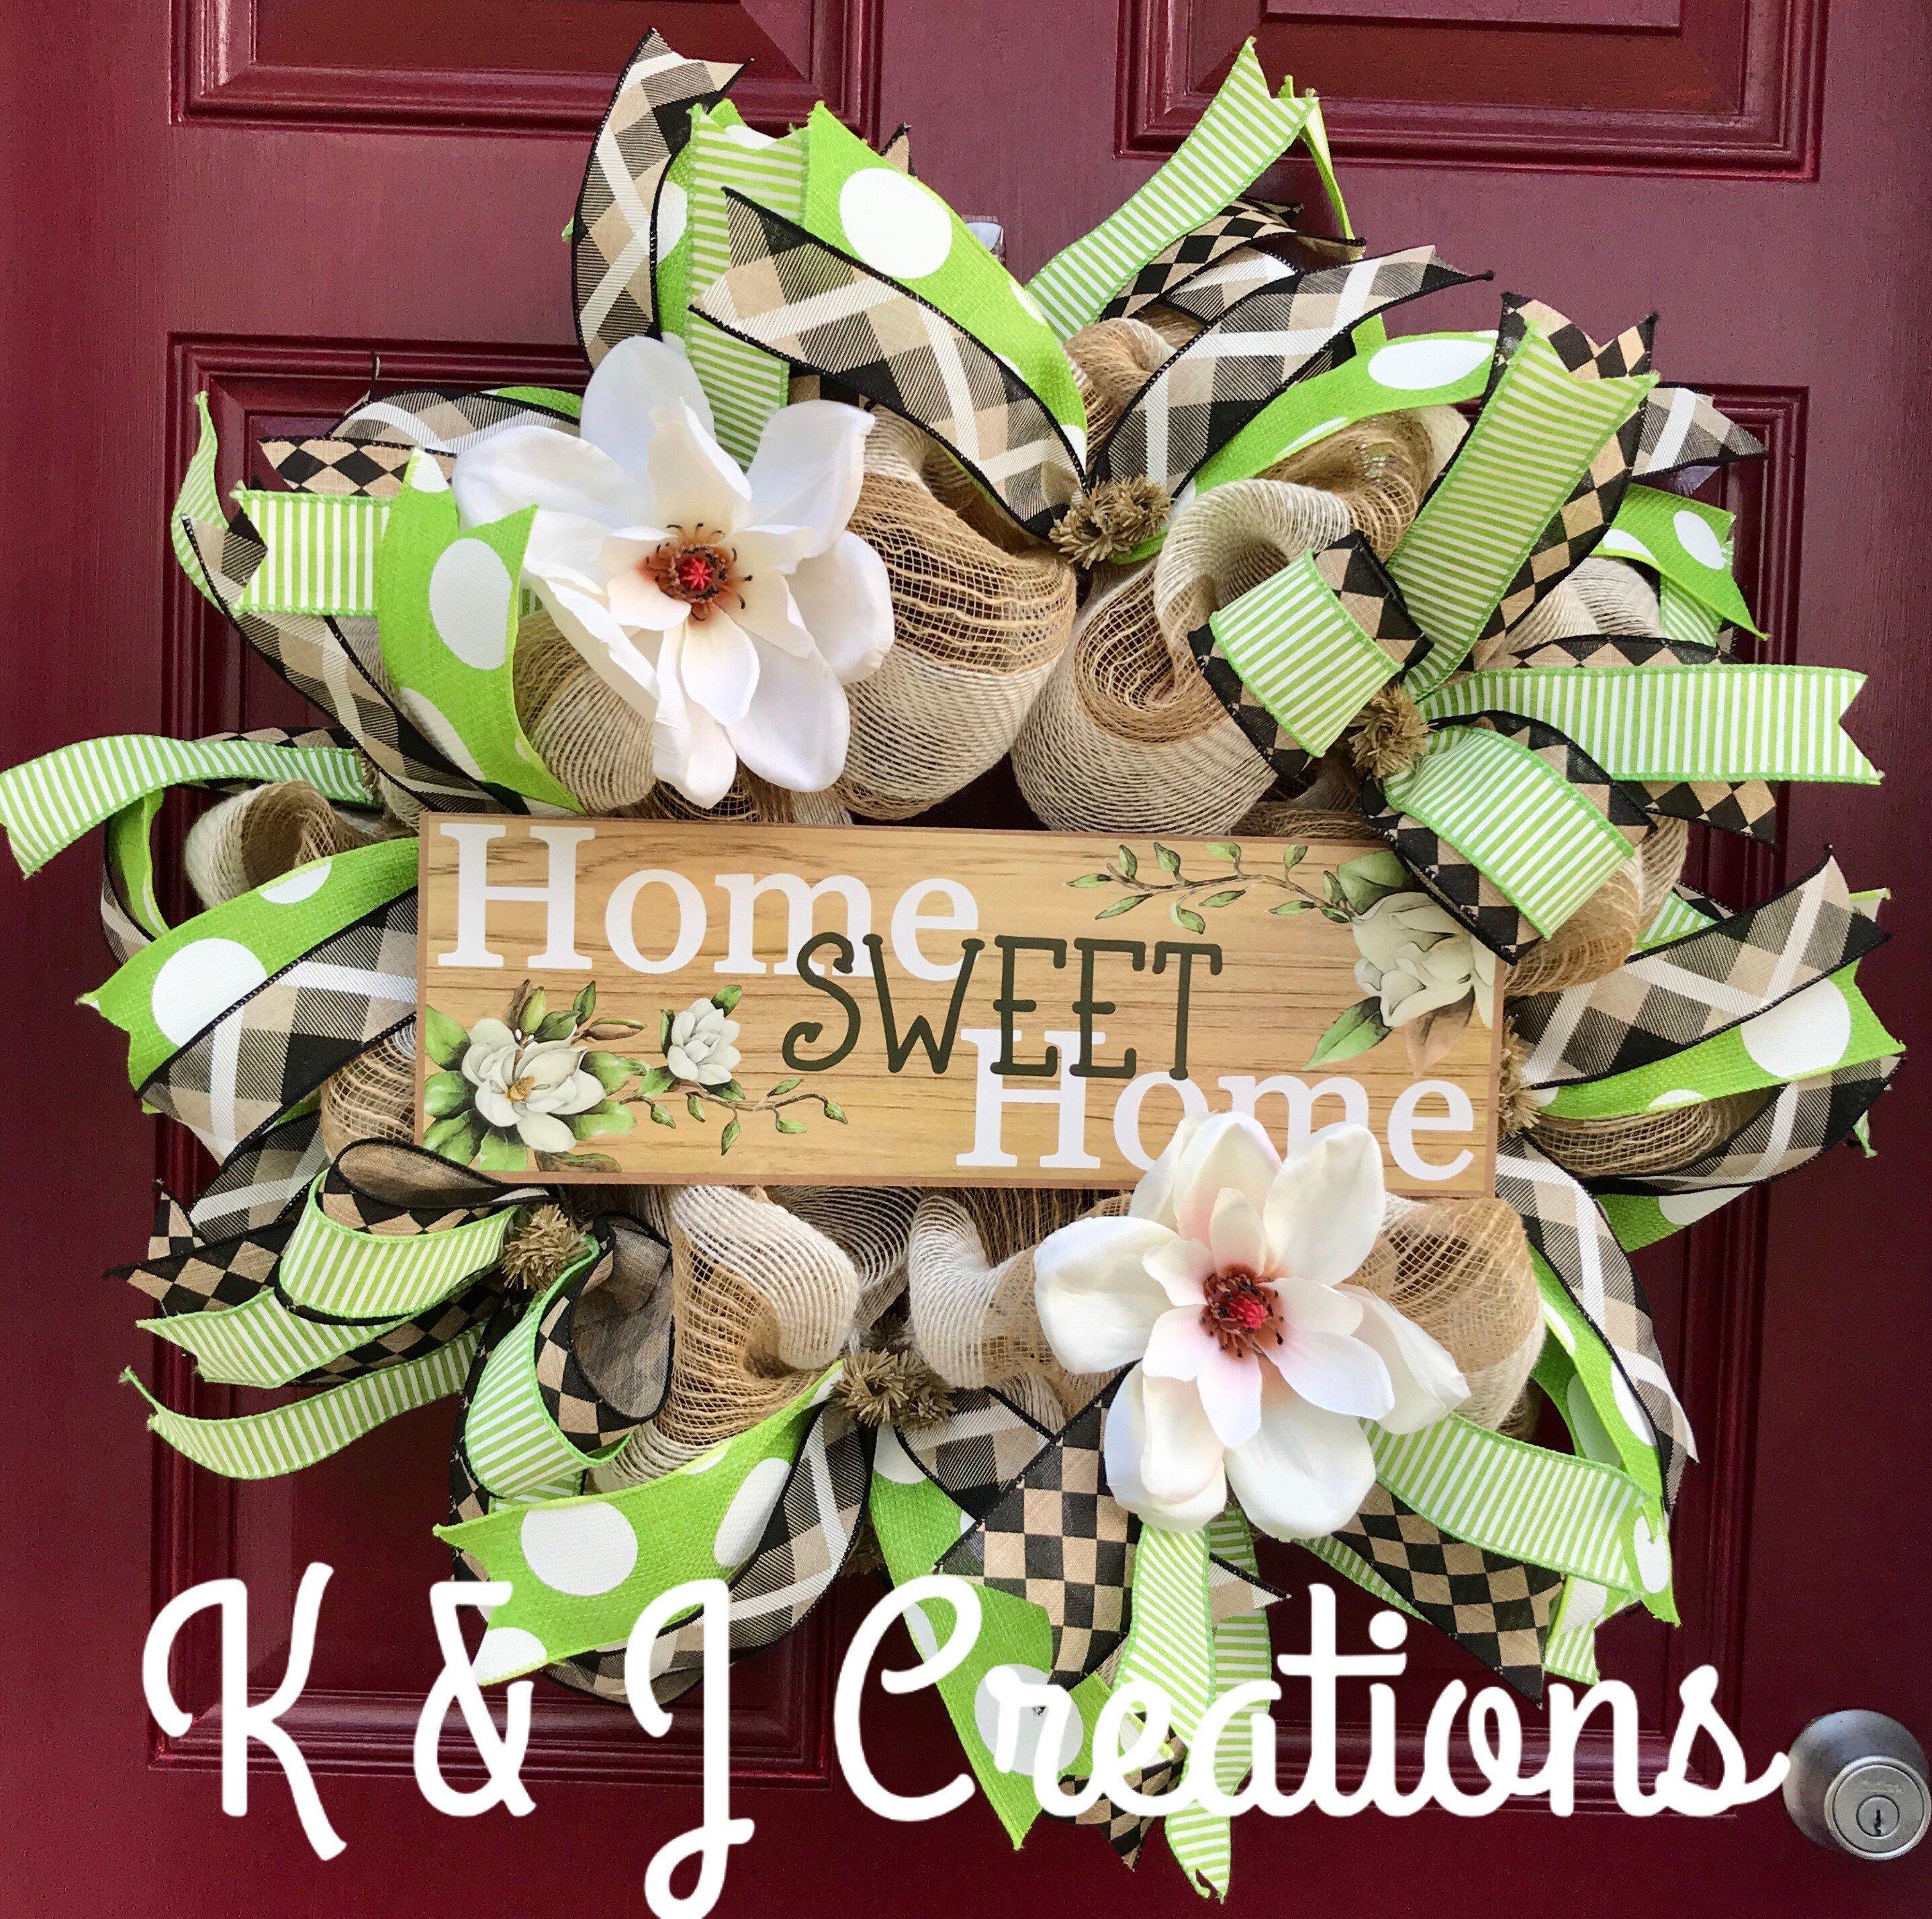 Photo of Magnolia Wreath for Front Door, Home Sweet Home Wreath, Everyday Wreath, Spring Decor, Farmhouse Wall Decor, Summer Wreath